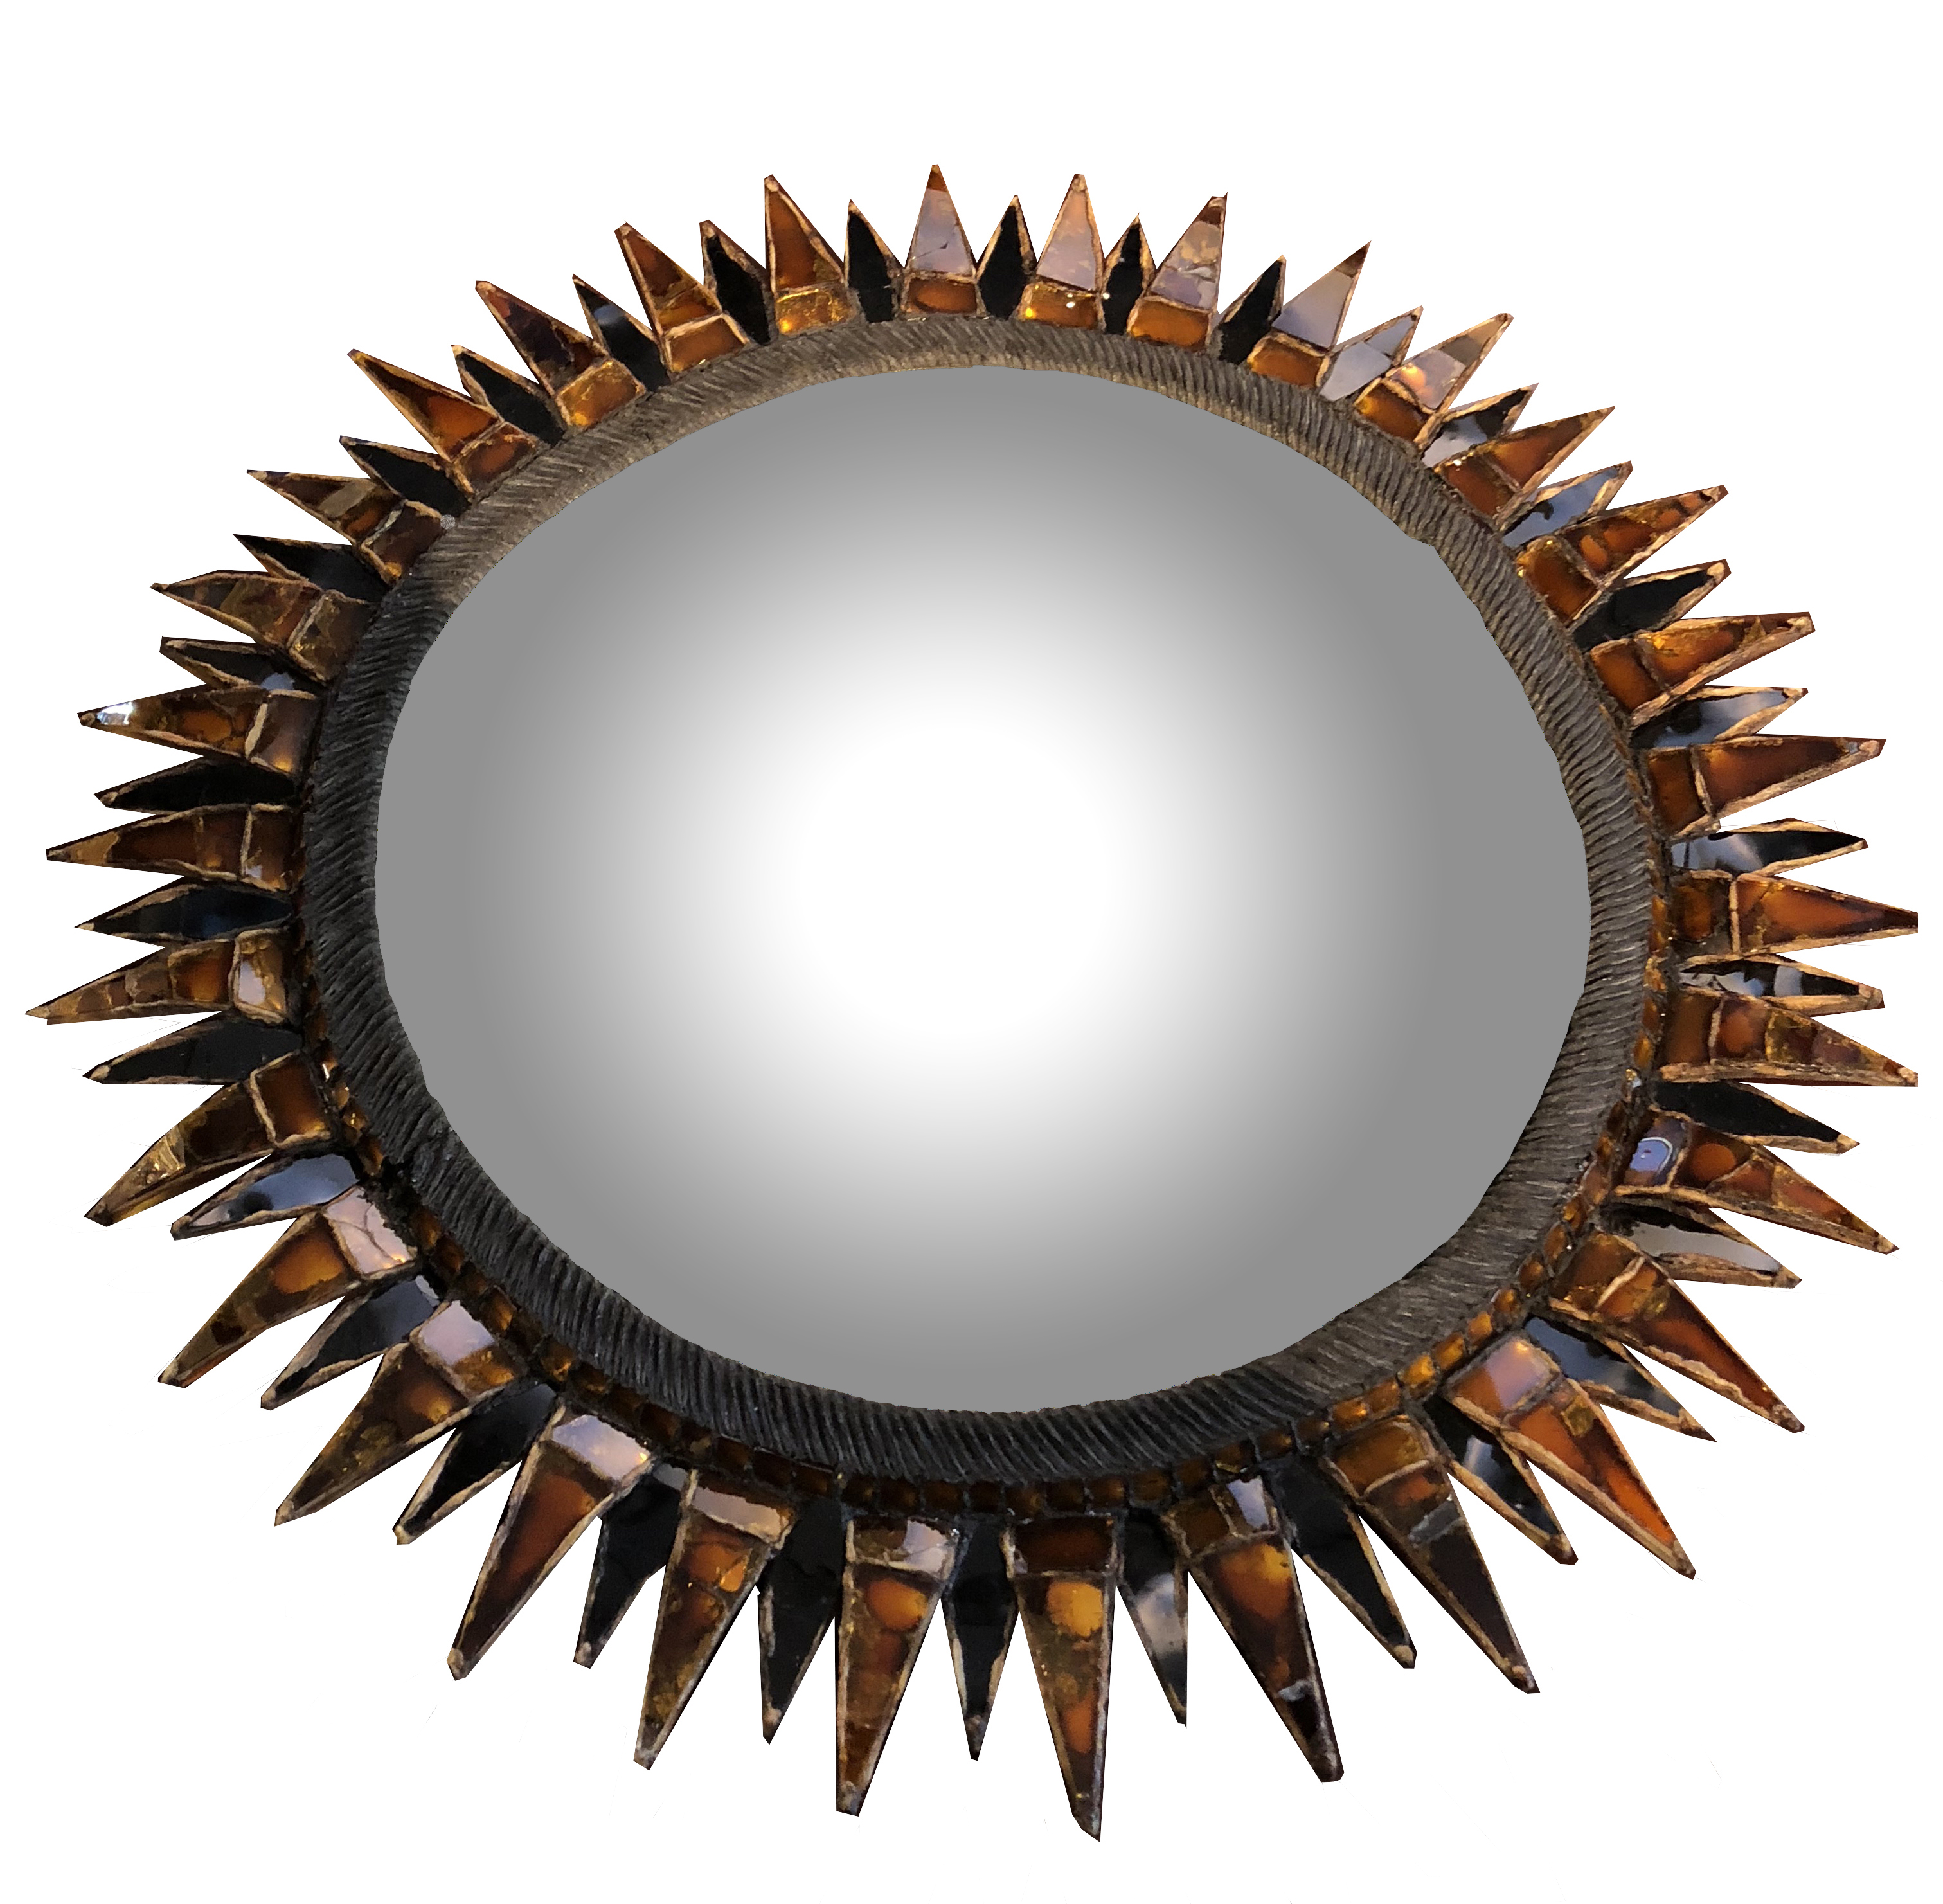 Miroir Soleil à pointe – Line Vautrin